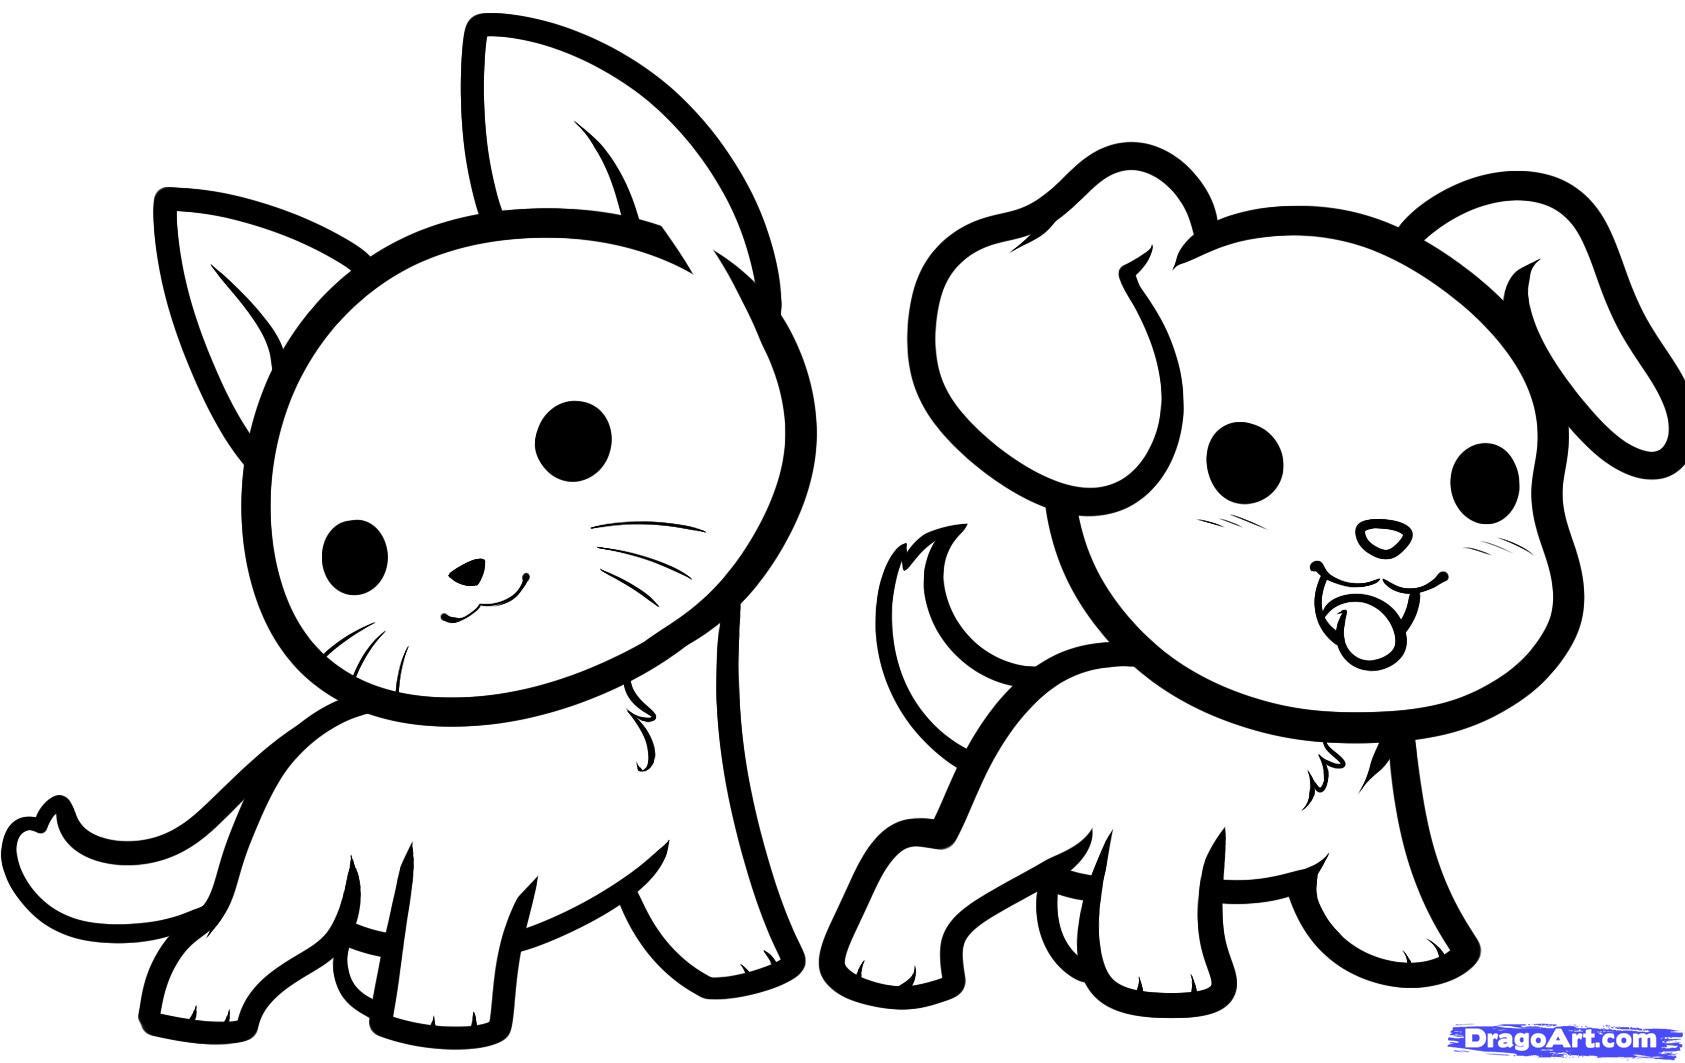 1685x1063 Drawn Kitten Cute Animal